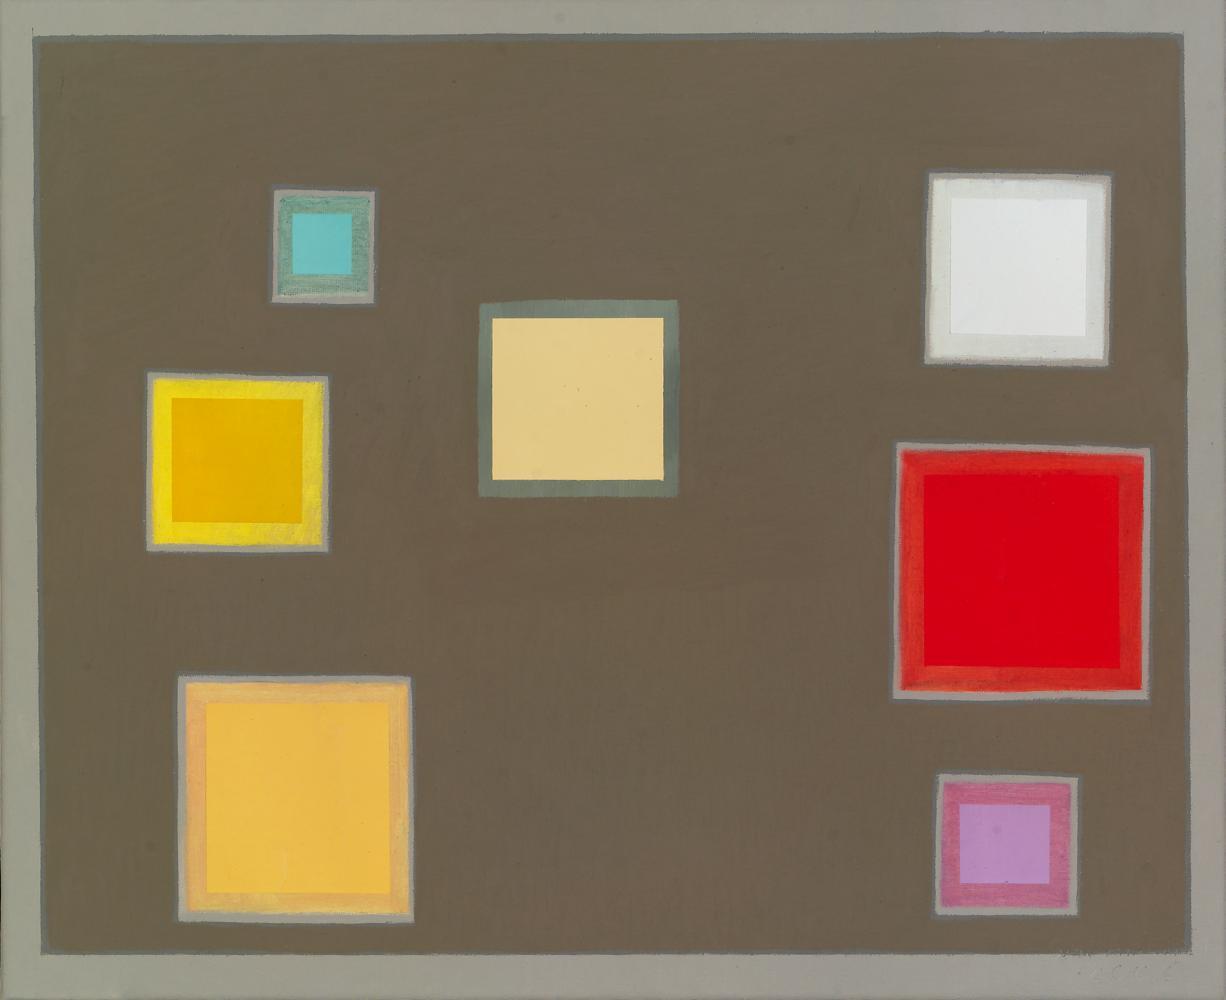 Siete cuadrados, 38 x 46 cm, óleo lienzo, 2006.